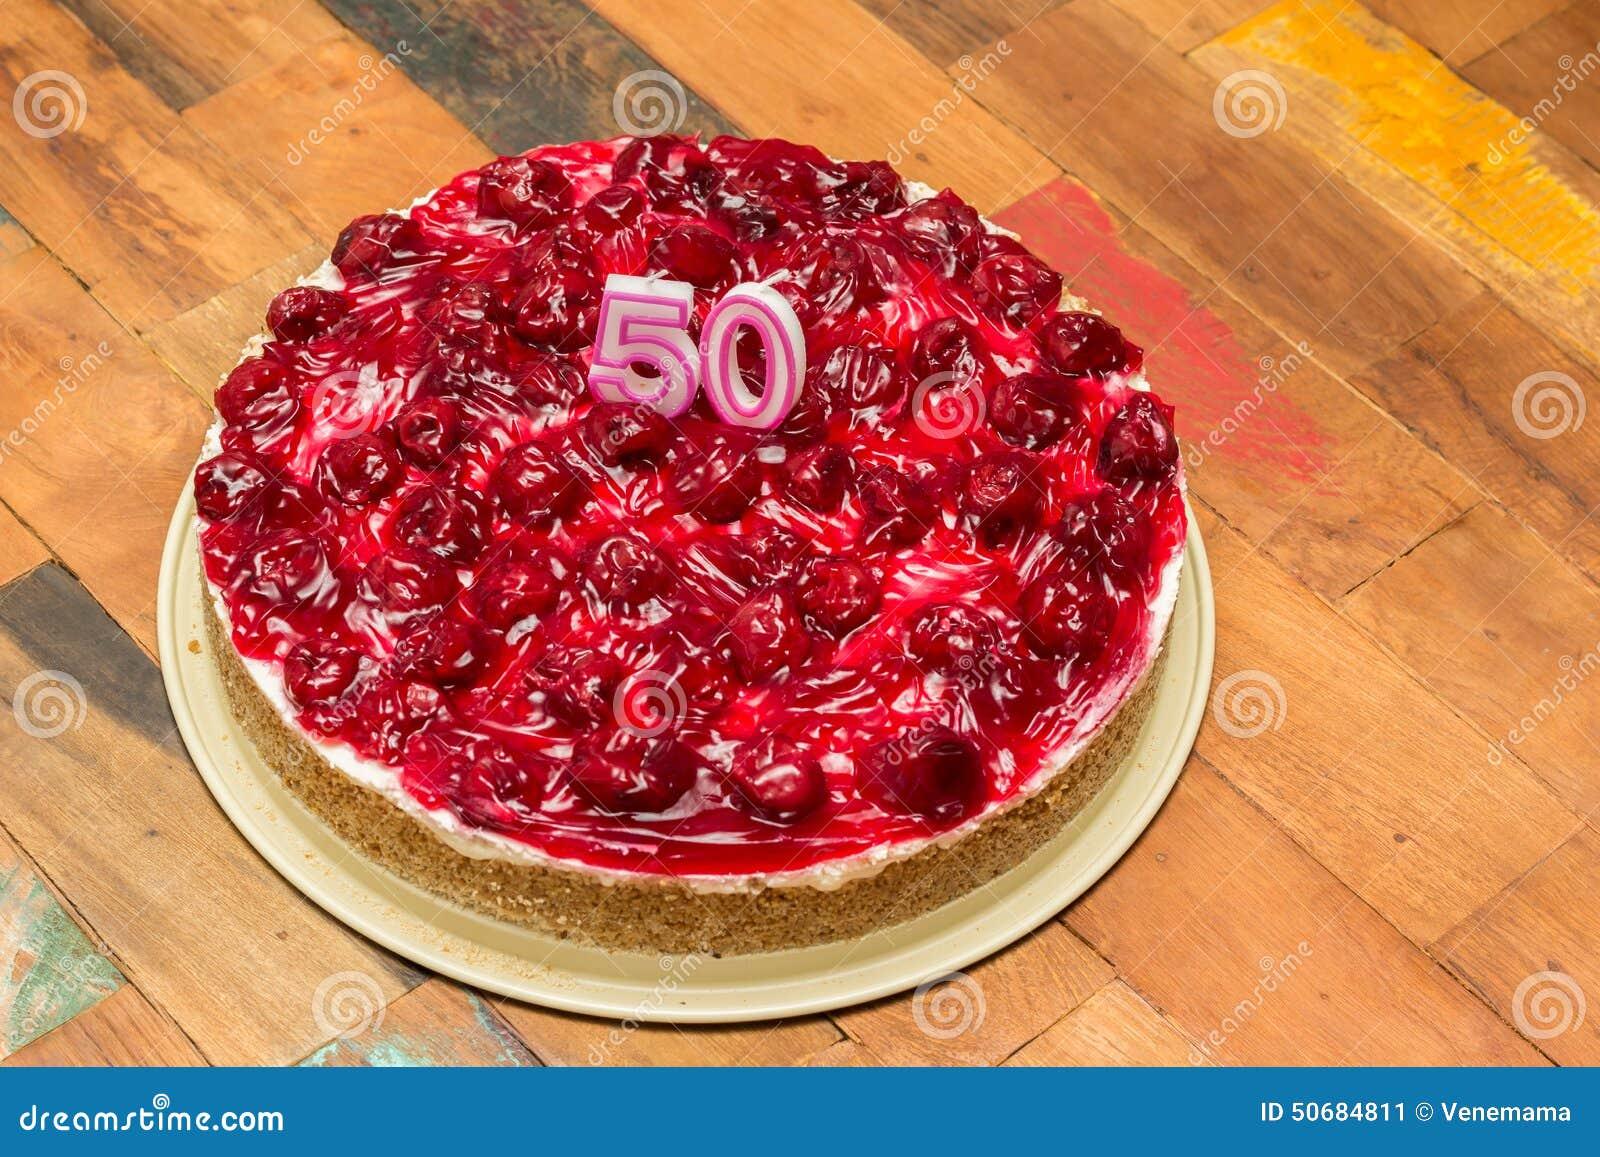 Download 与蜡烛的樱桃乳酪蛋糕为第50个生日 库存图片. 图片 包括有 乳酪蛋糕, 新鲜, 五十, 酥皮点心, 蛋糕 - 50684811